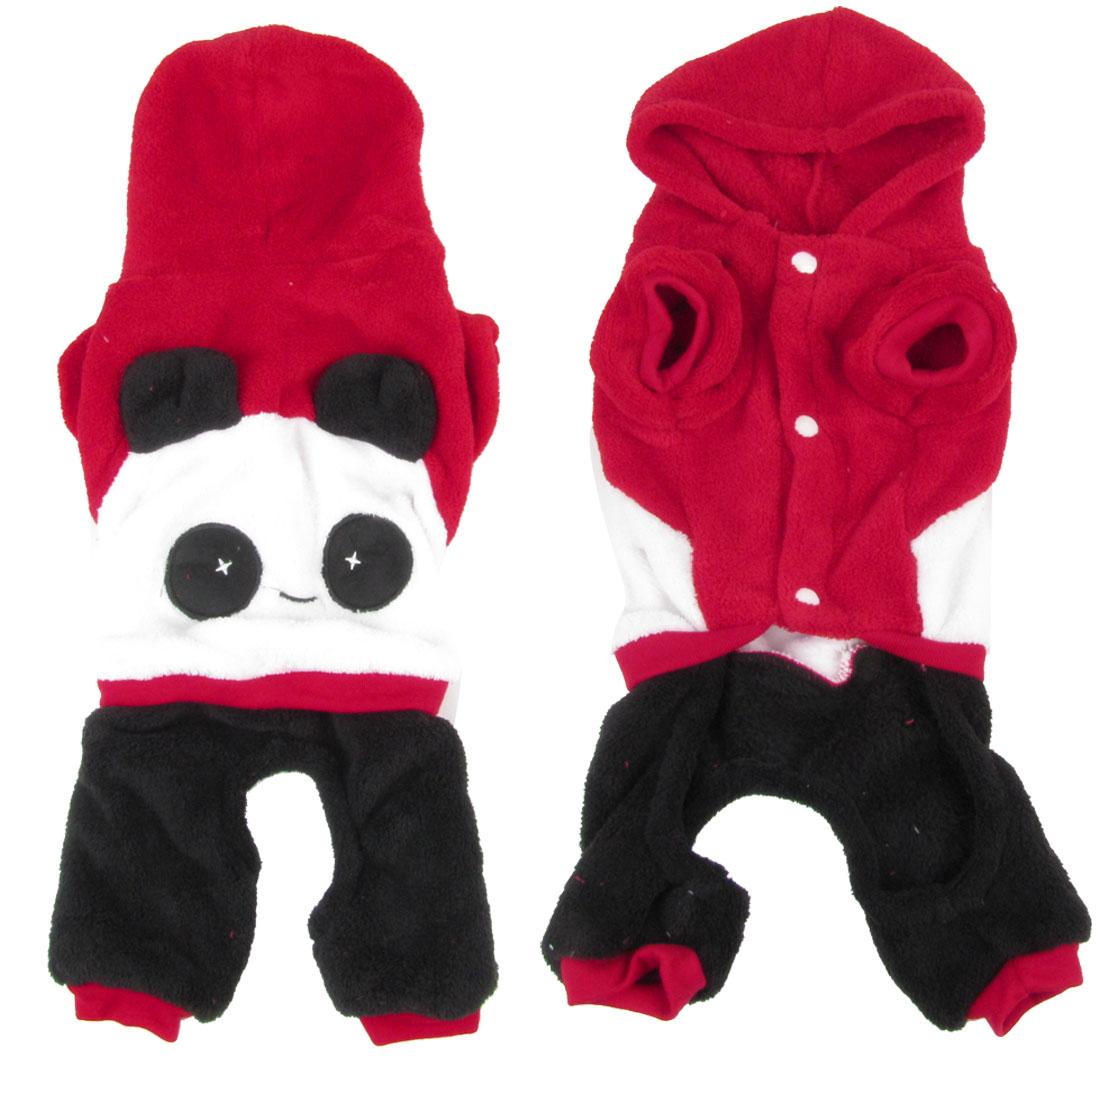 Warm Plush Panda Shaped Chihuahua Pet Dog Cat Apparel Clothes Jumpsuit Red XL